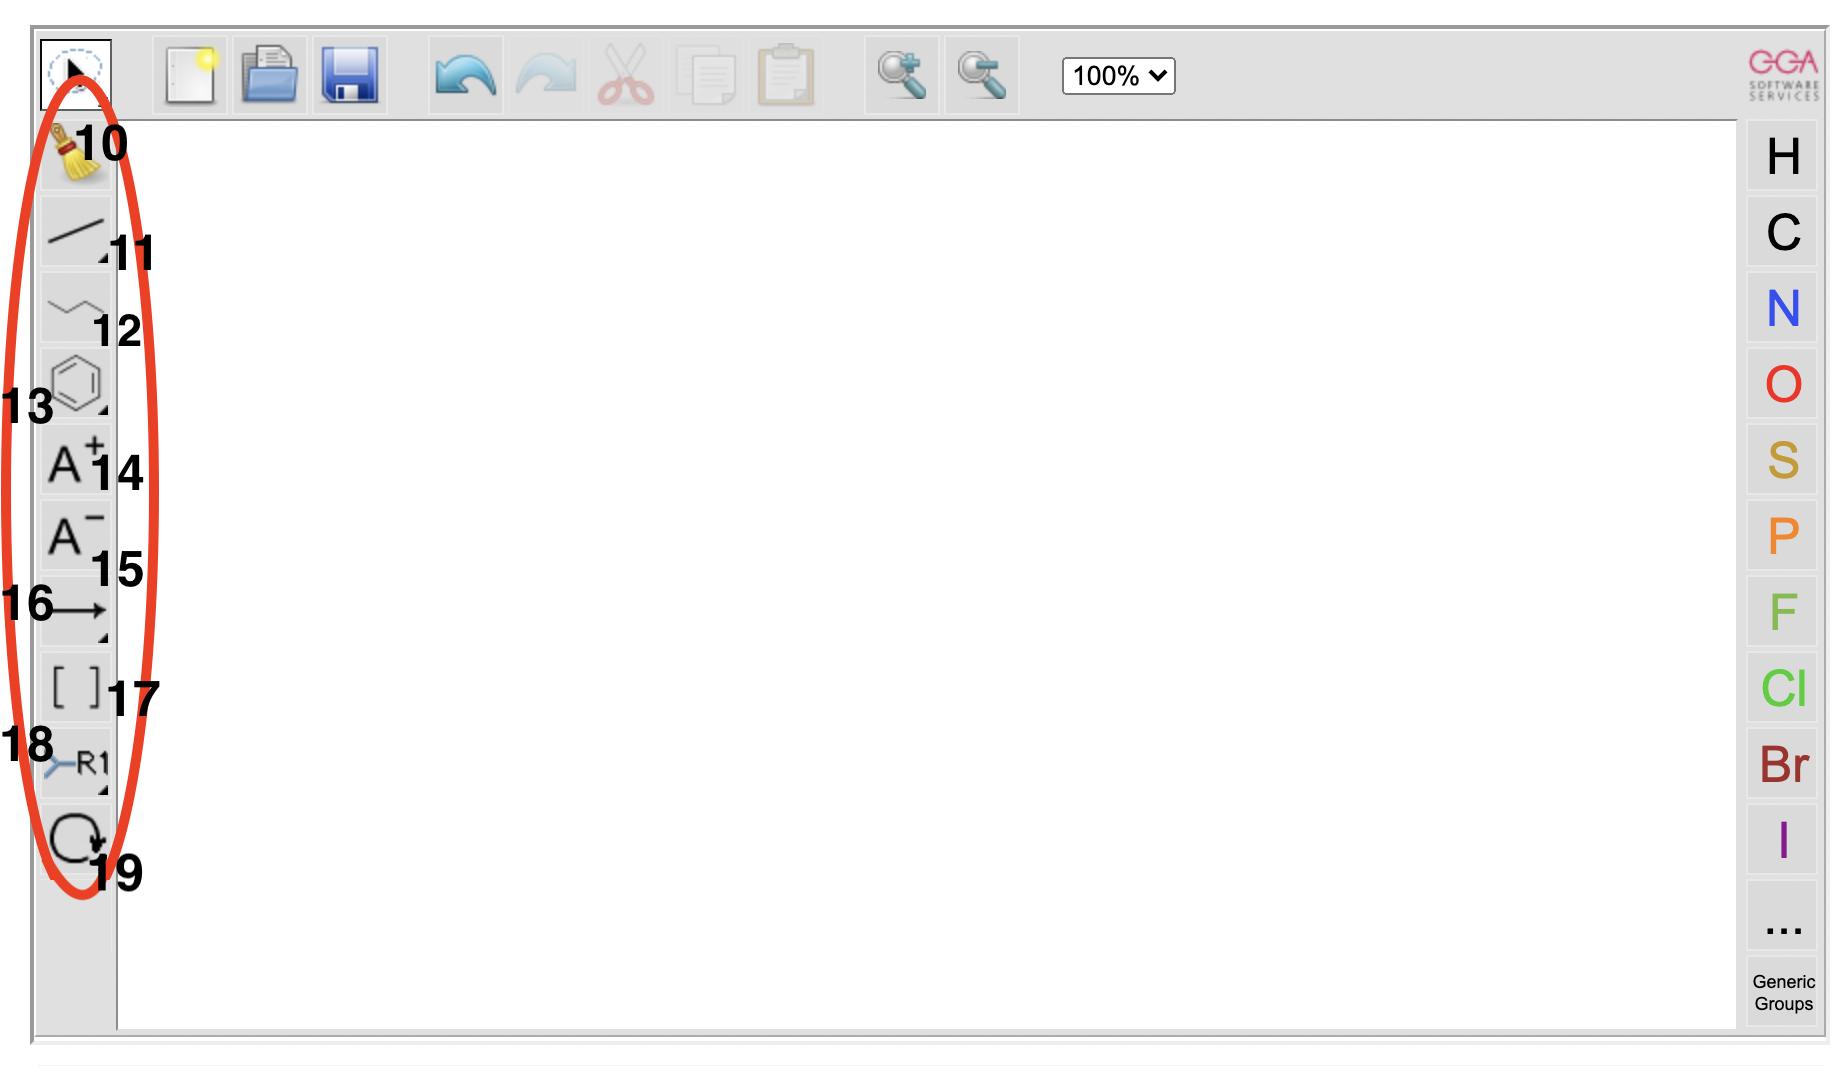 A screenshot of the left toolbar